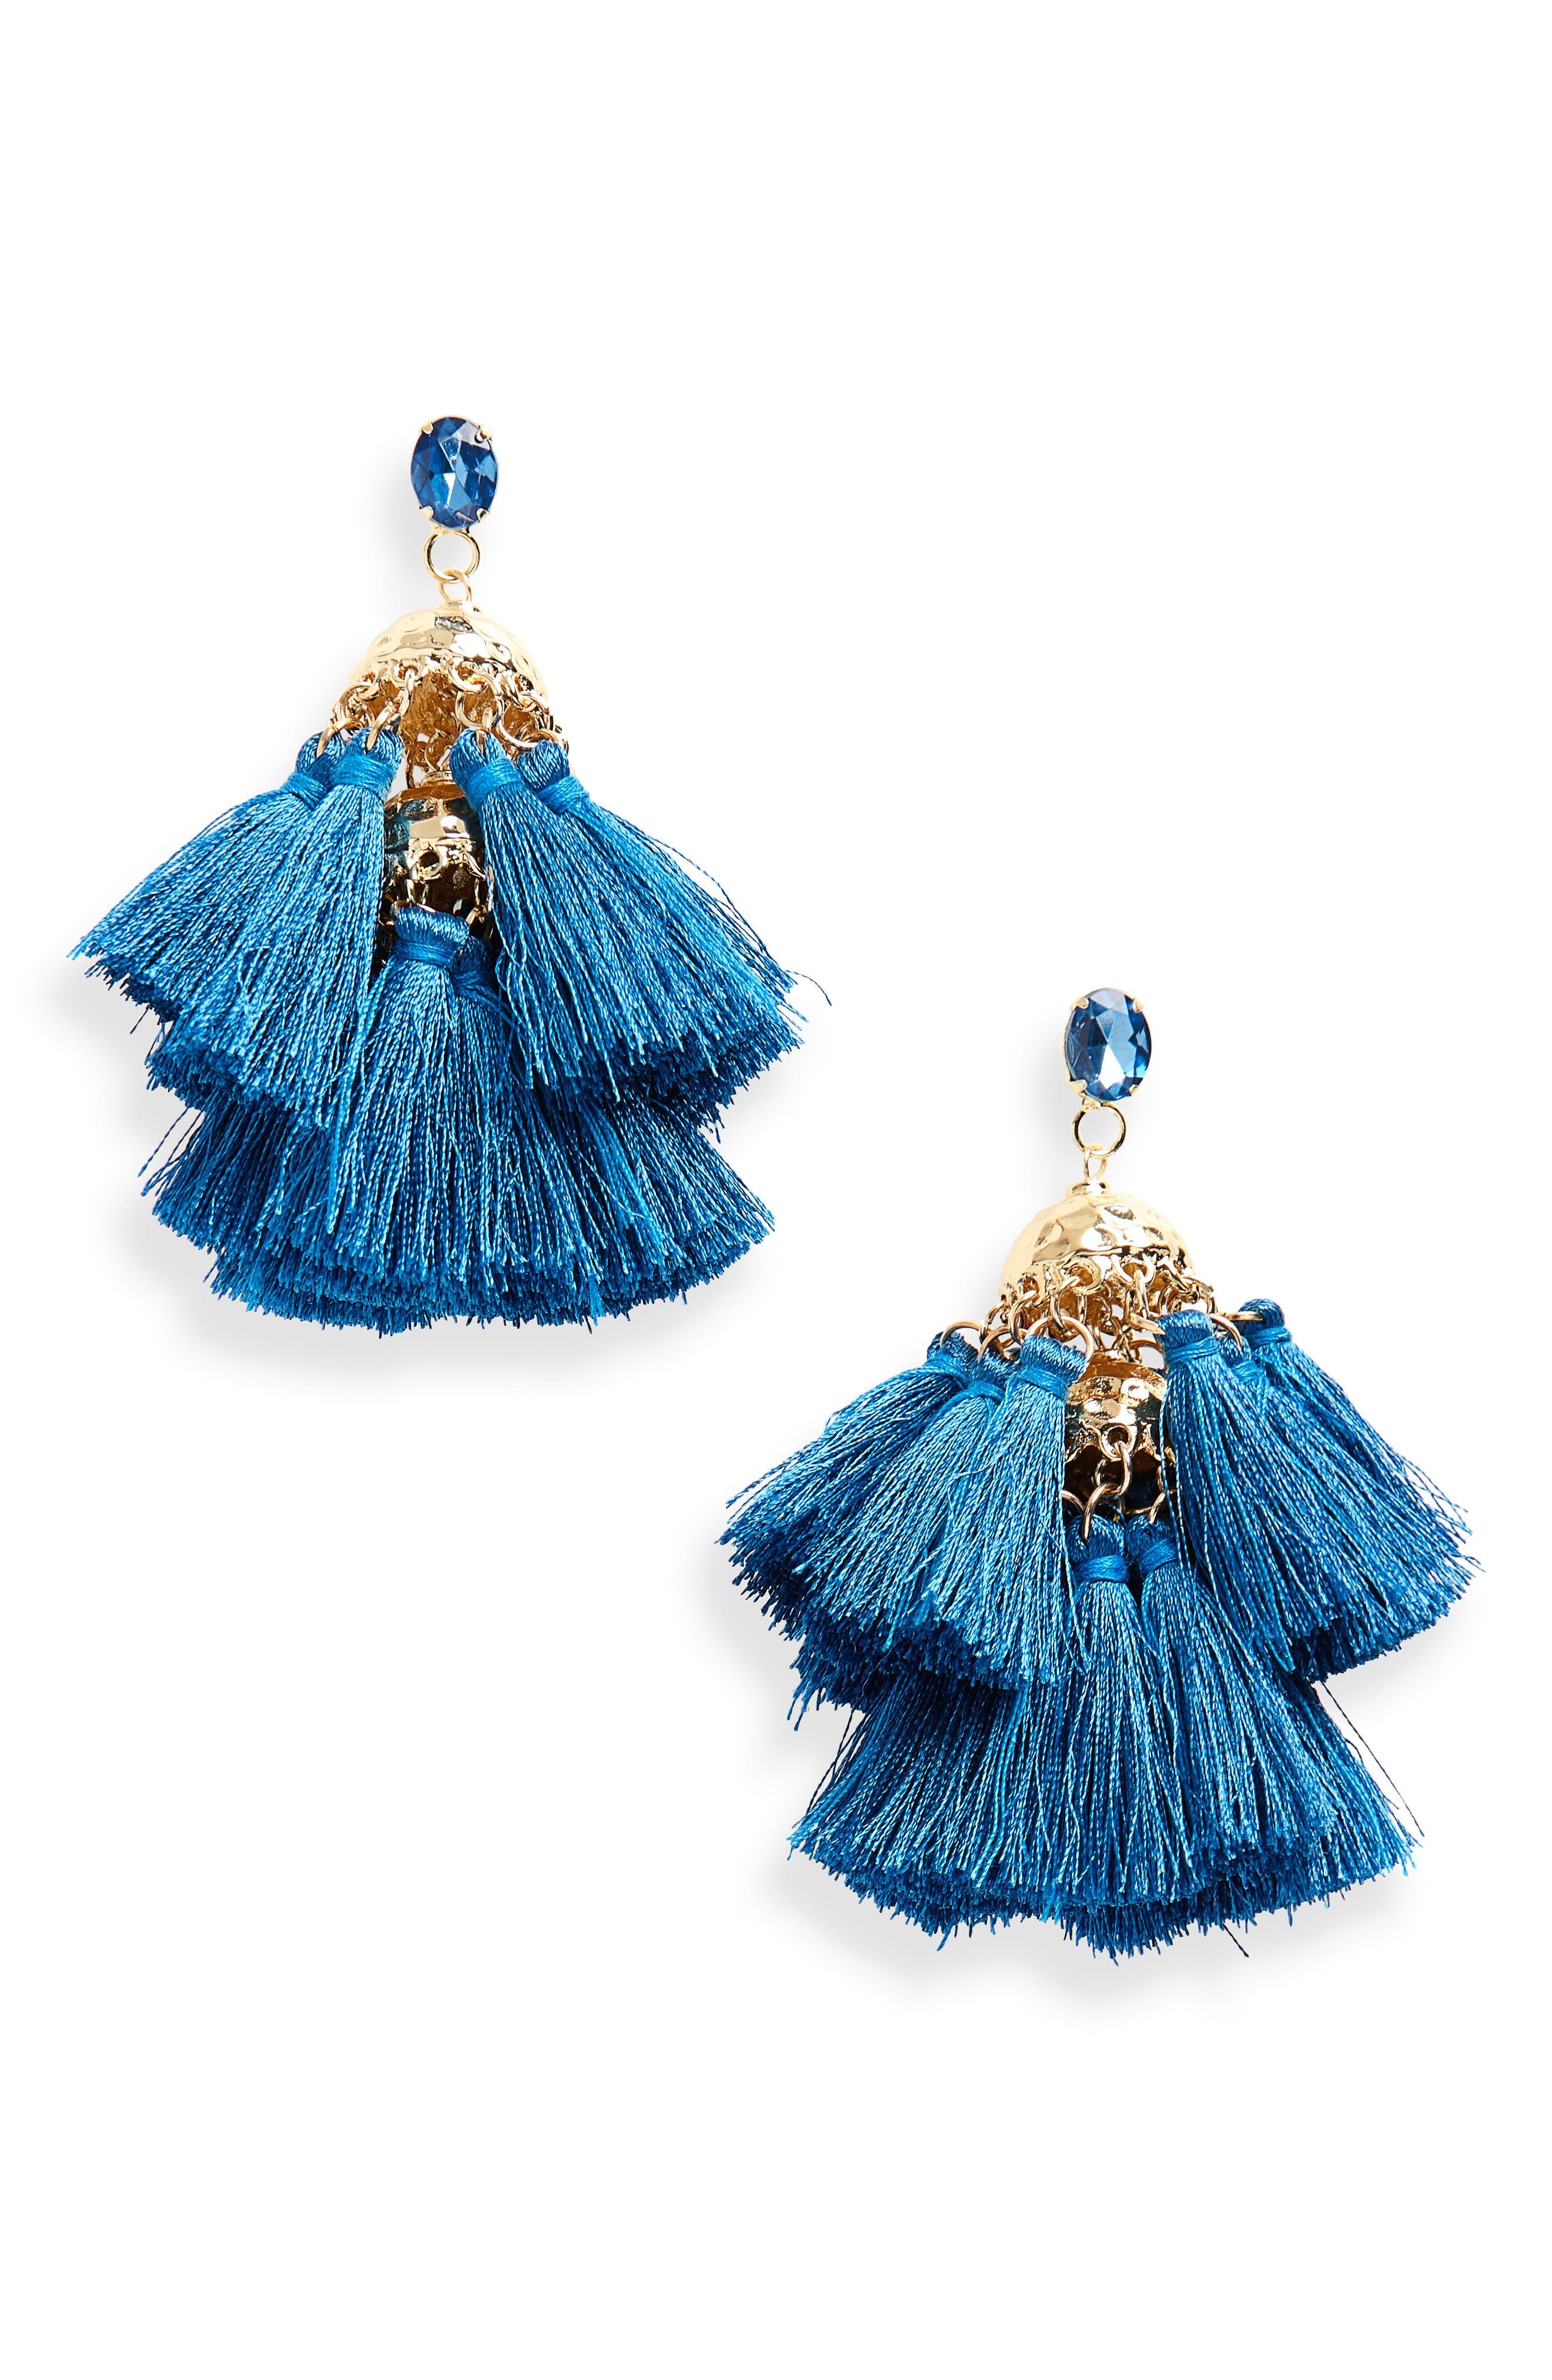 Hammered Charm & Tassel Earrings,                         Main,                         color, Gold/ Blue